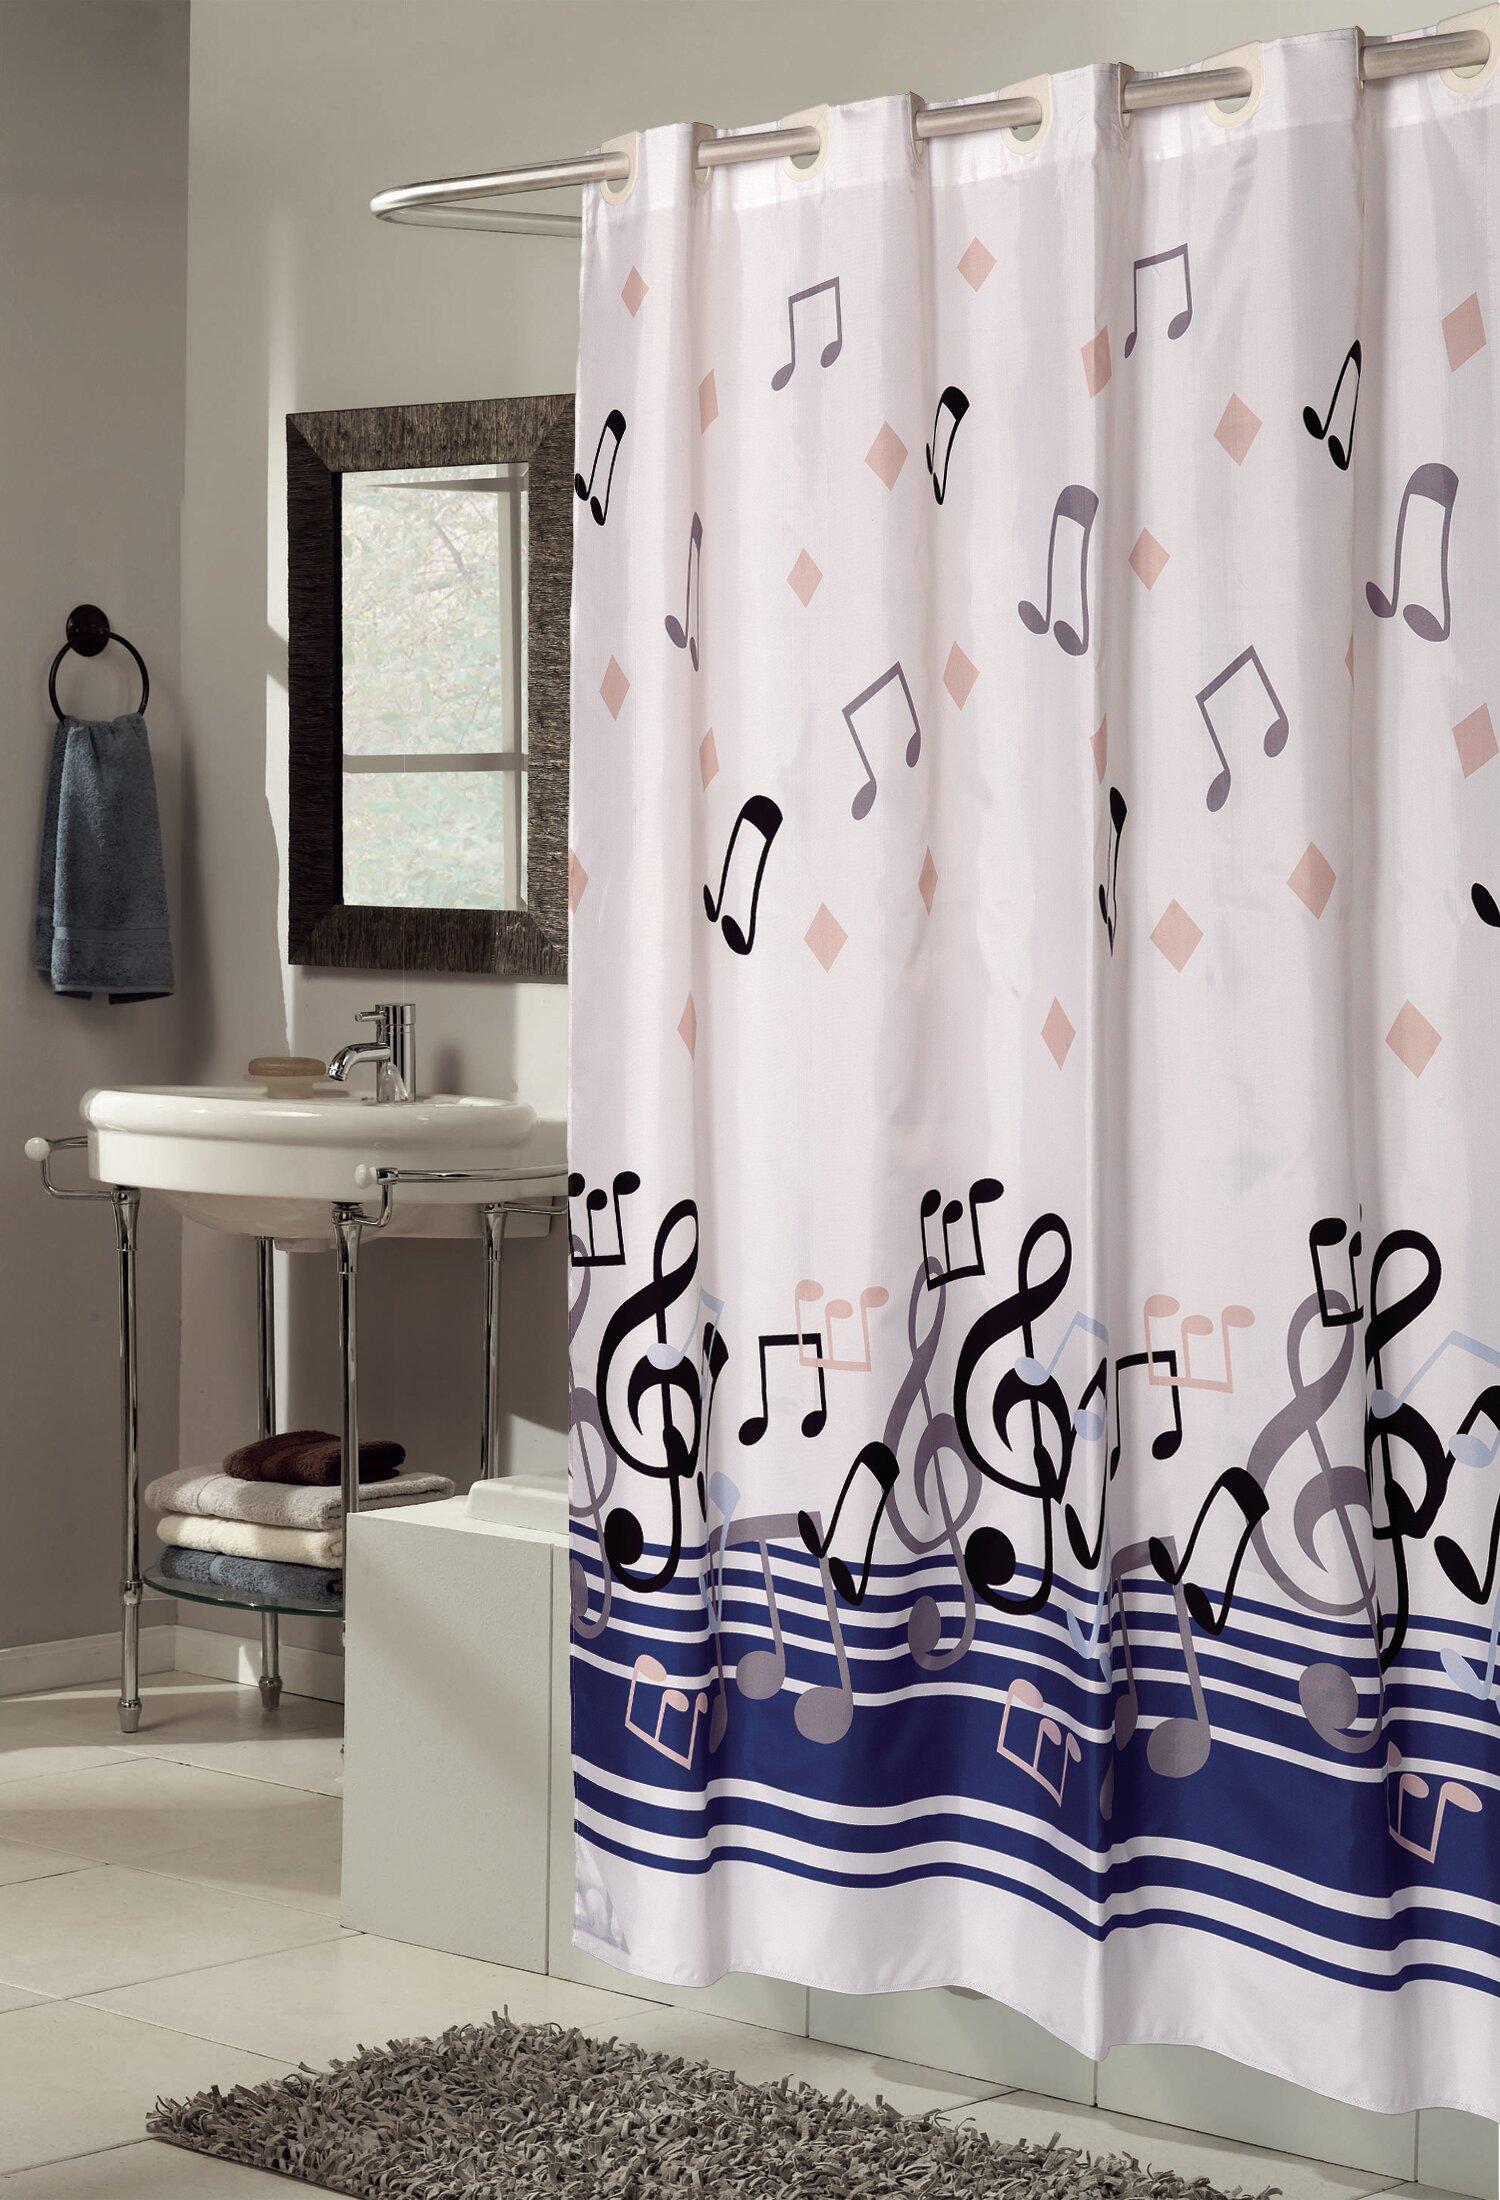 Ben And Jonah EZ ONR Blue Note Shower Curtain